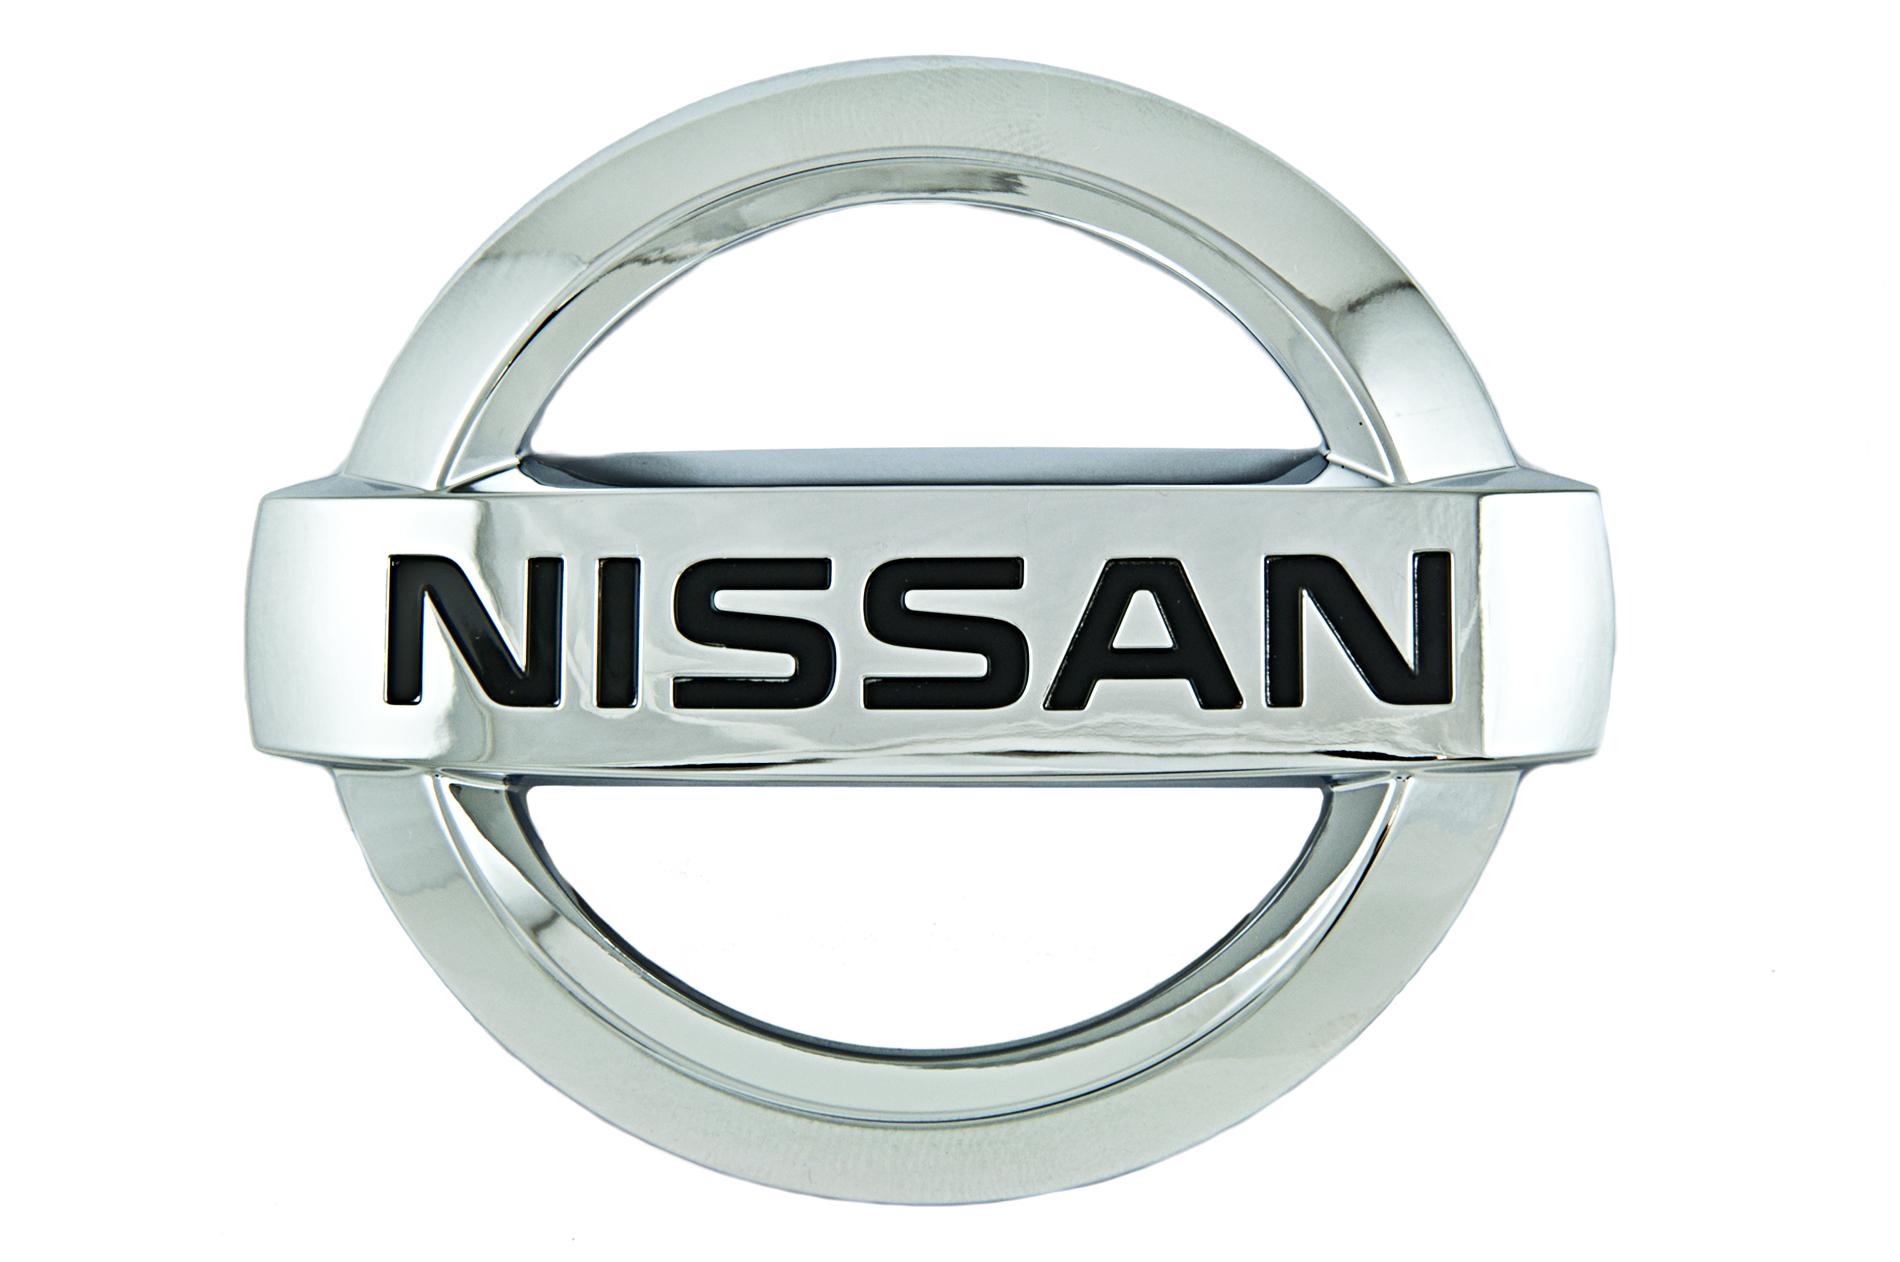 Эмблема NISSAN 84896jn04a